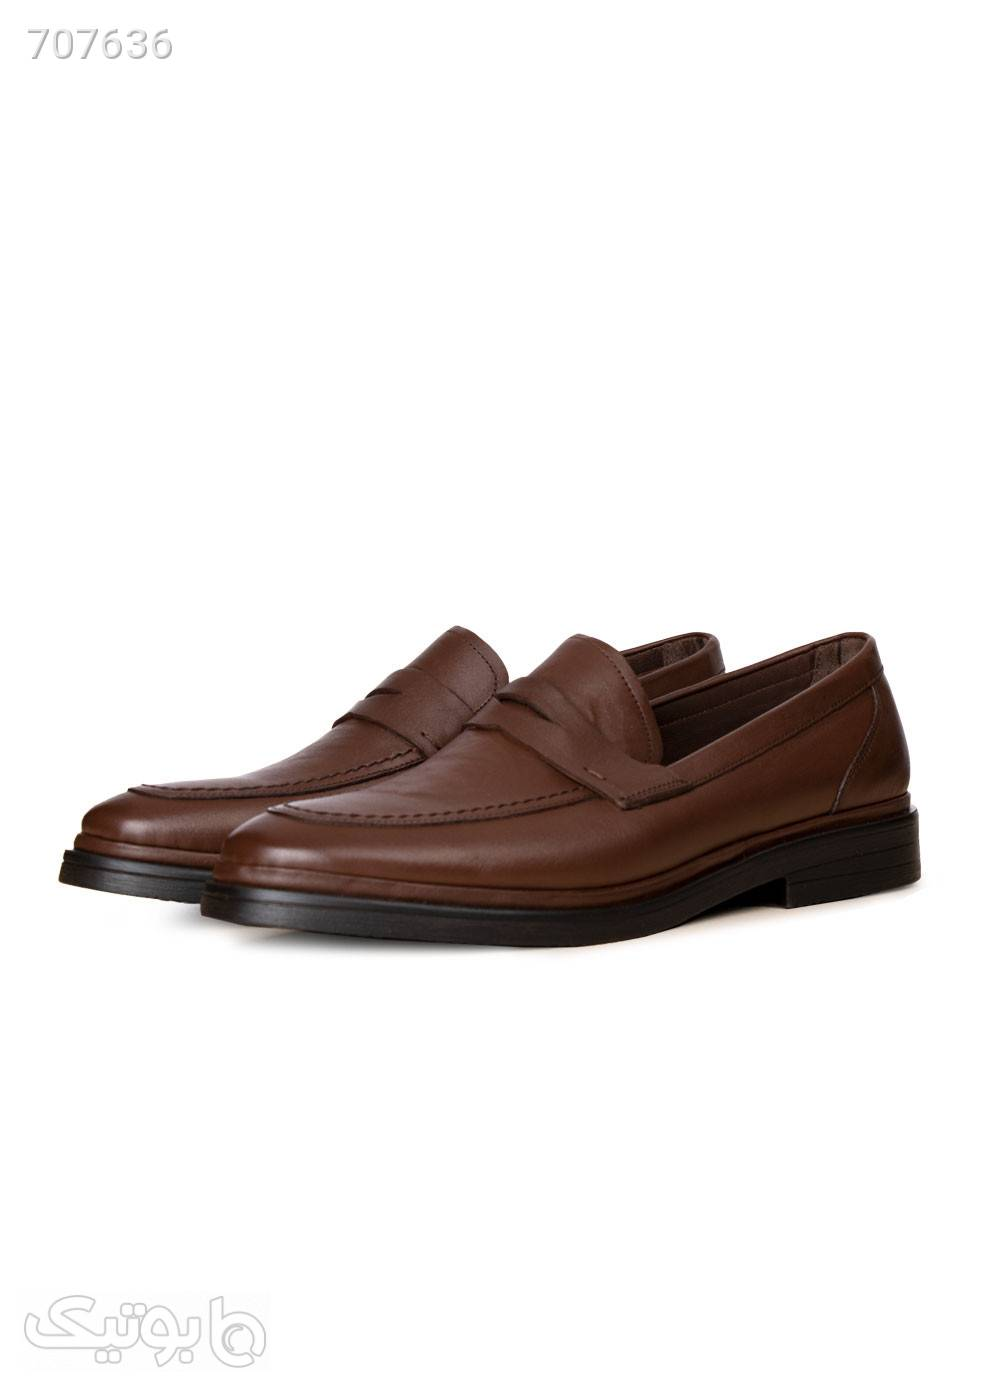 کفش کلاسیک مردانه ۶۰۲۷ مشکی كفش مردانه